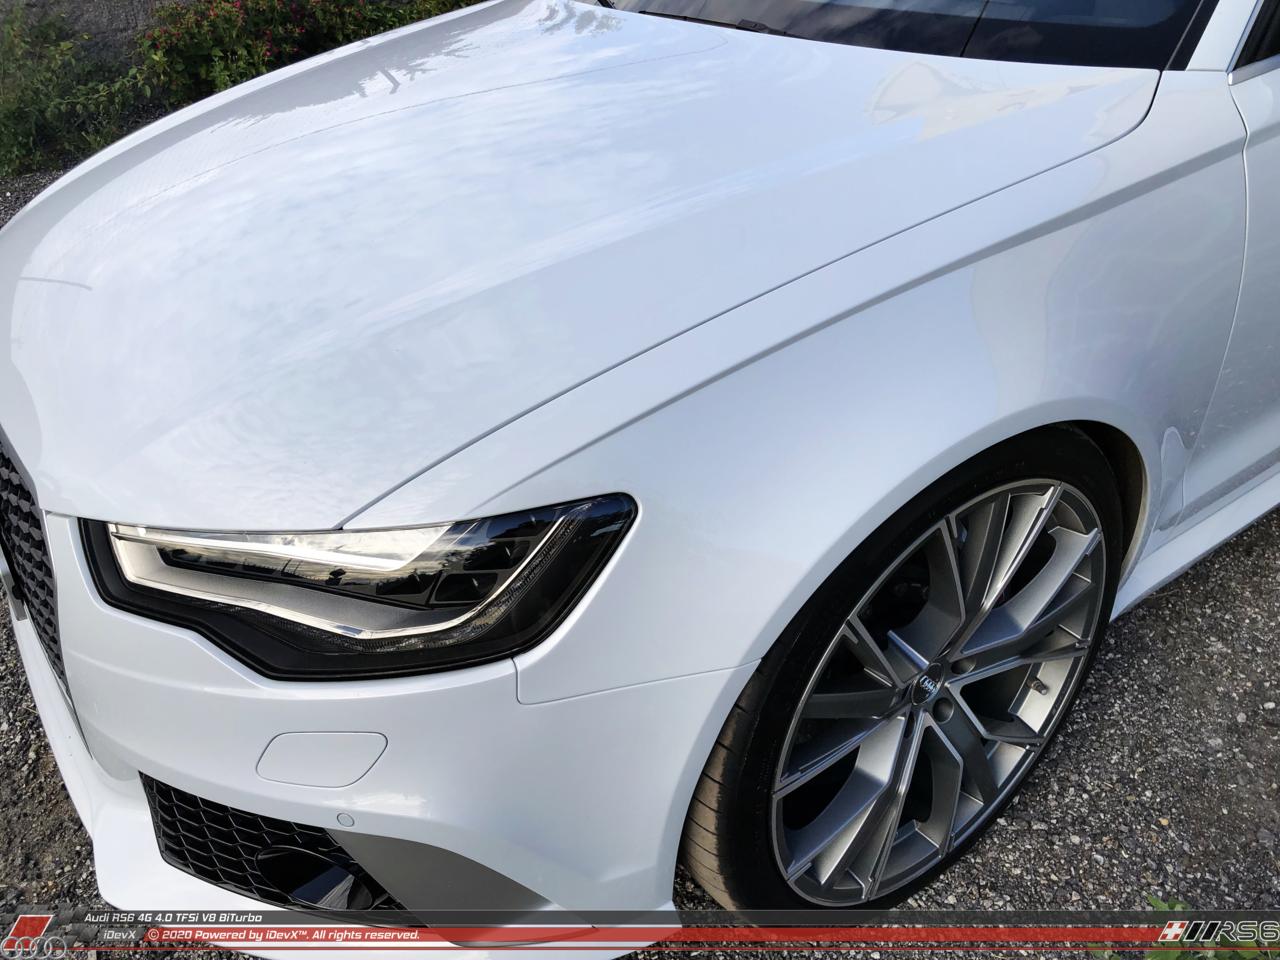 05_08.2019_Audi-RS6_iDevX_039.png